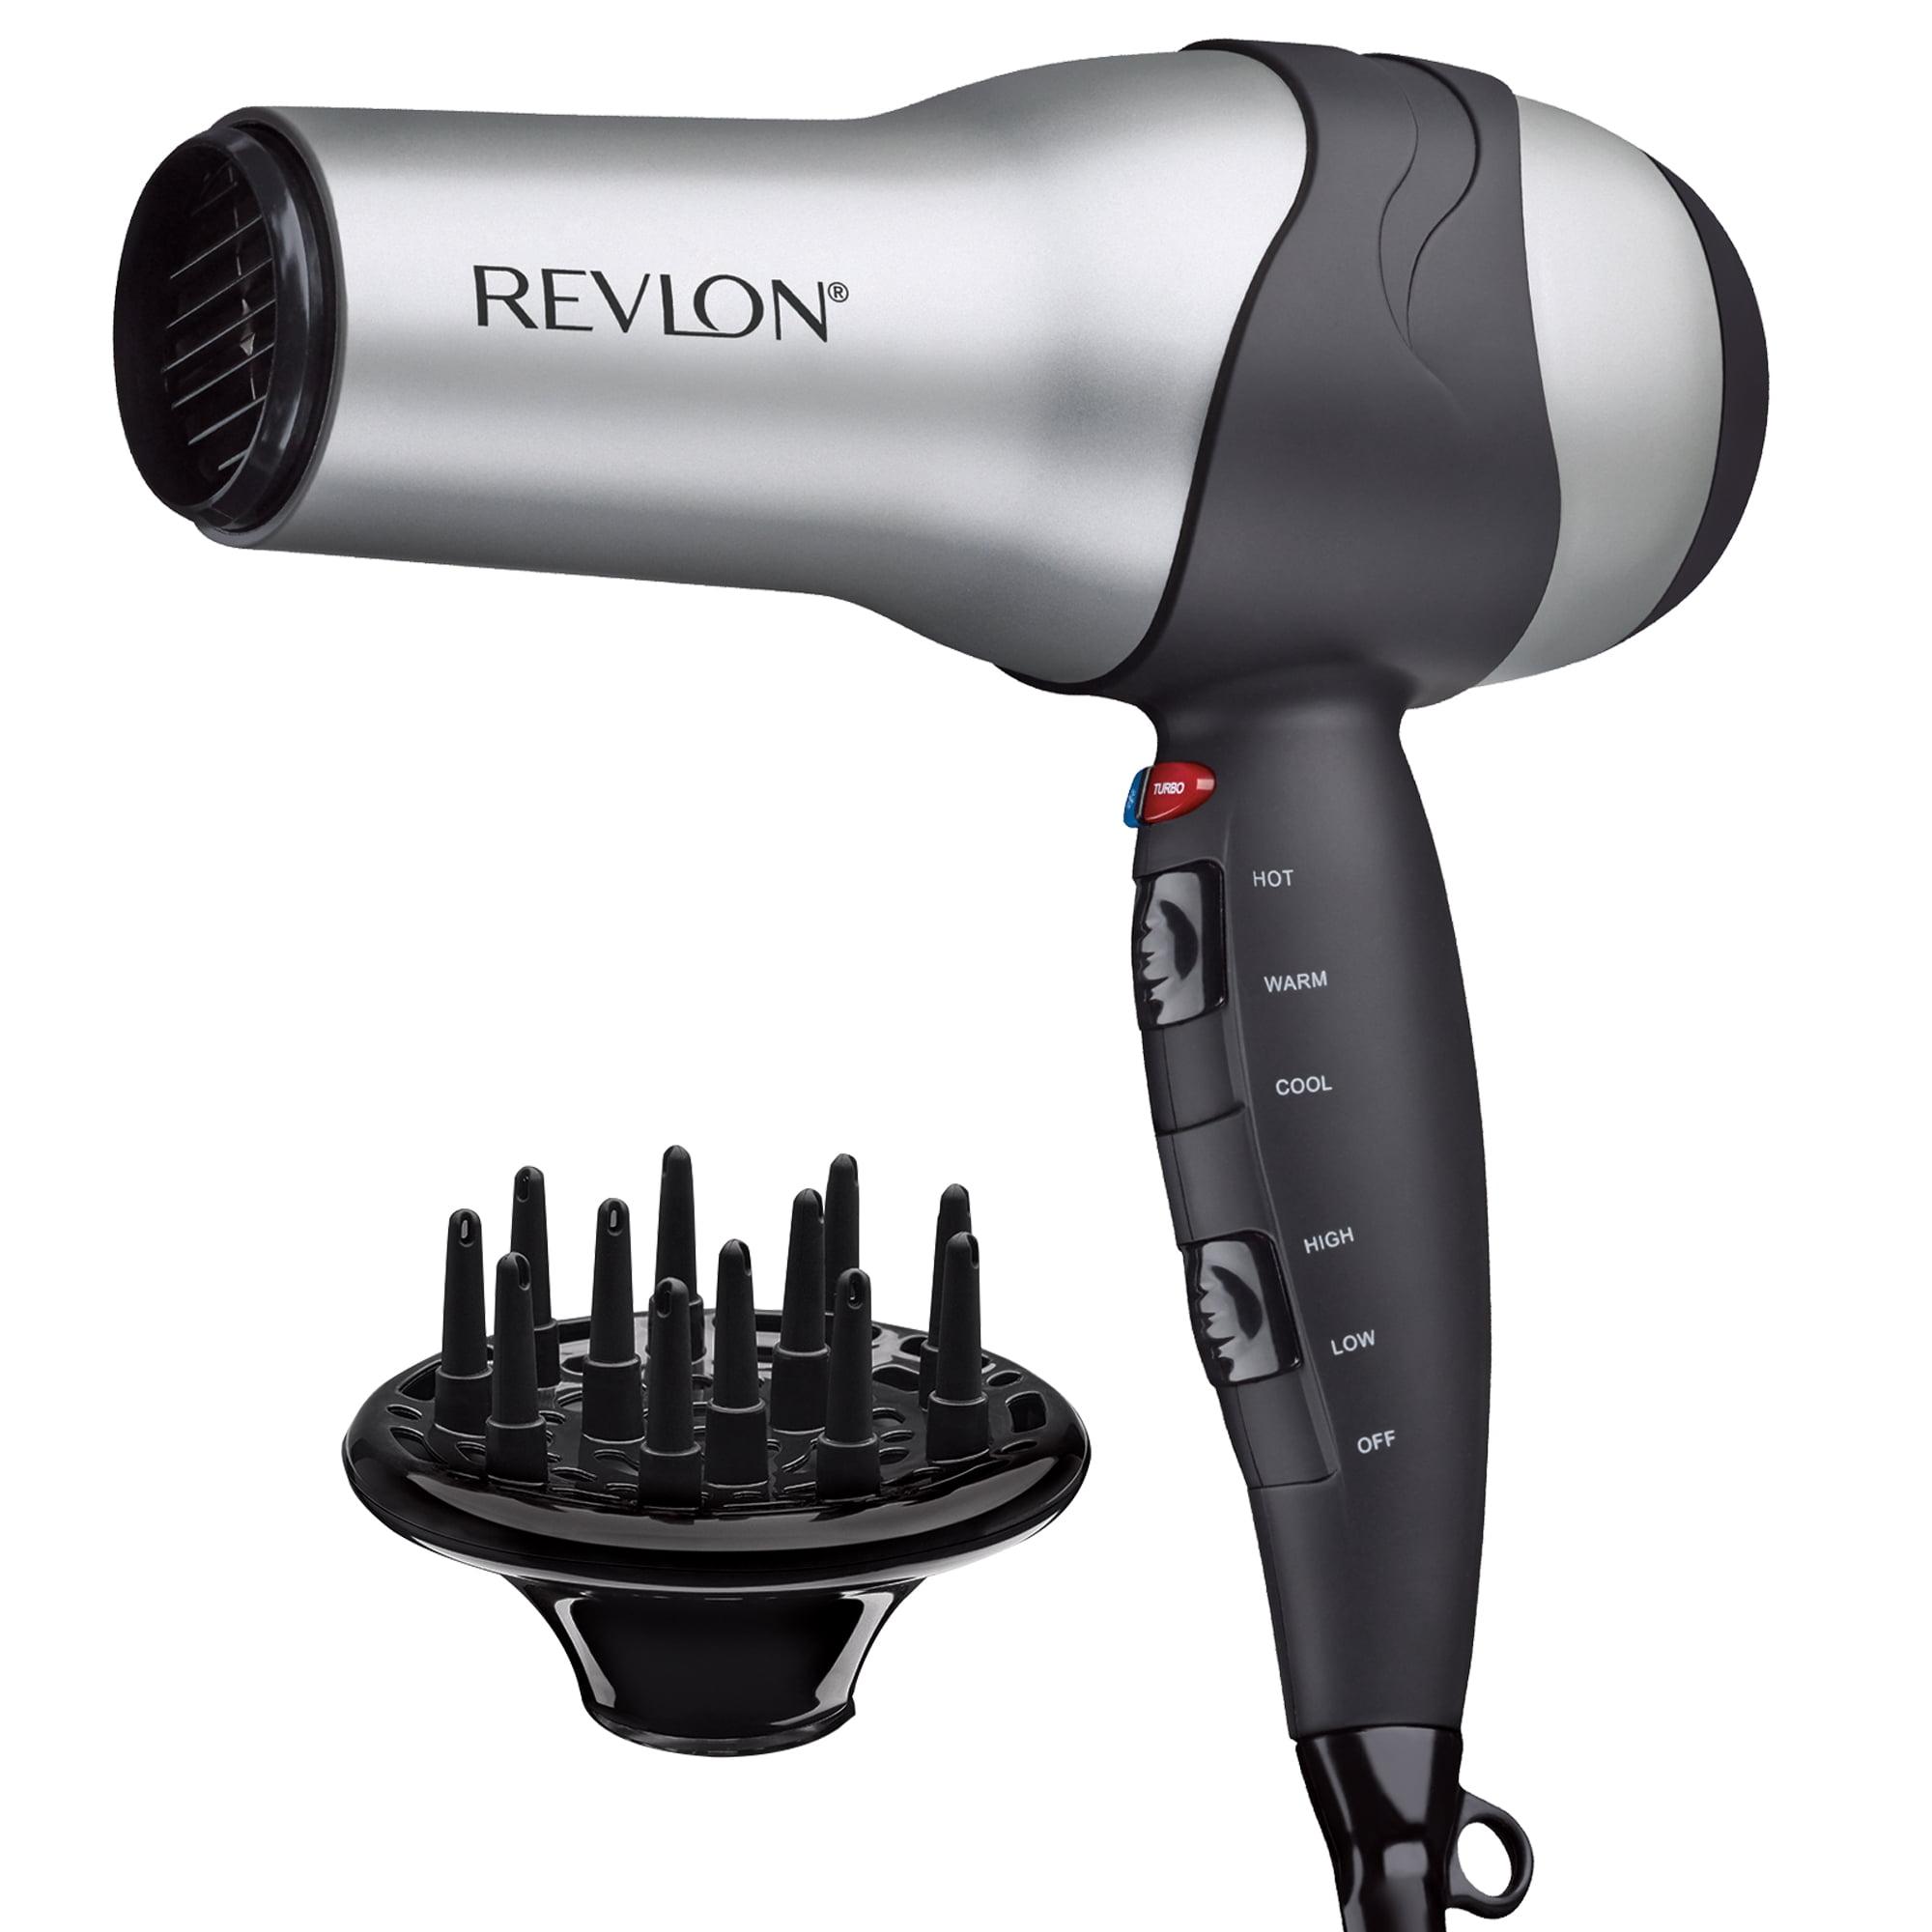 REVLON Hair Dryer with accessories